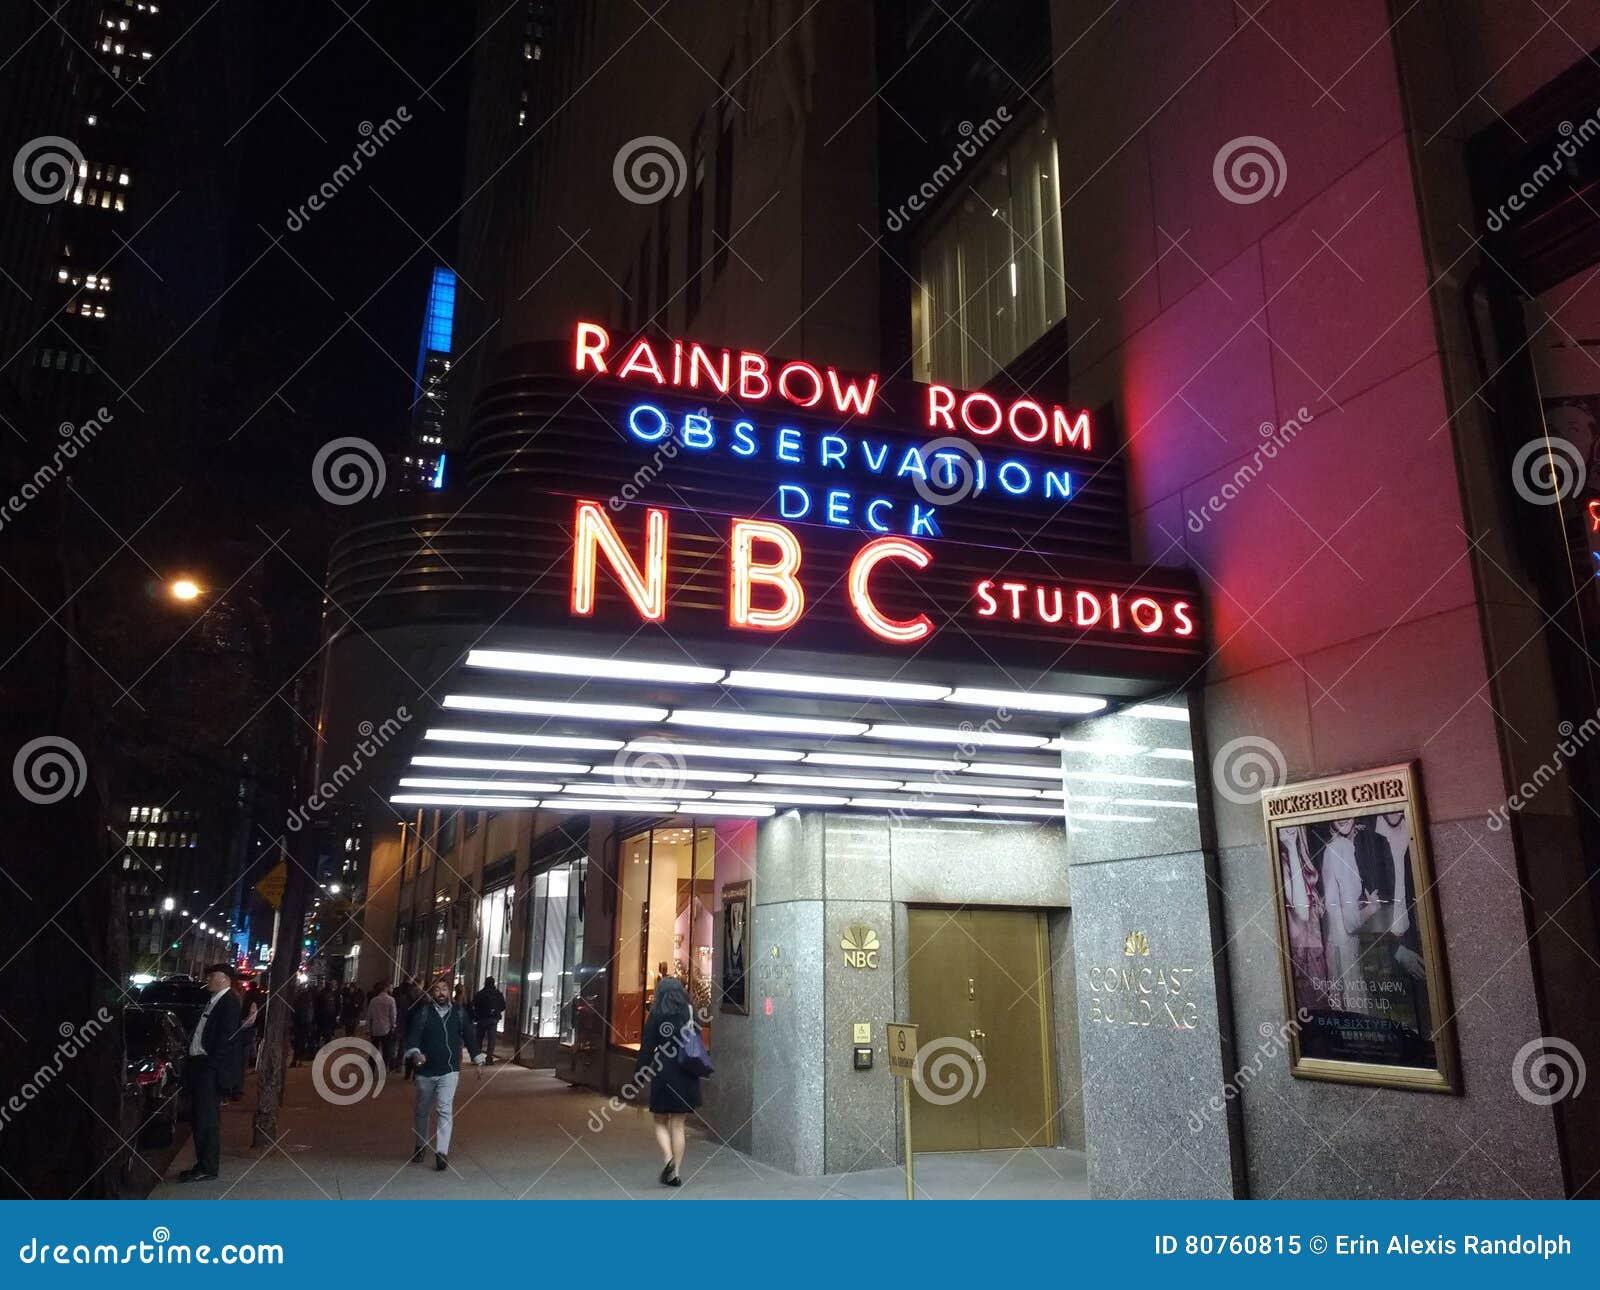 1 2 7 3 Down The Rockefeller Street: NBC Studios, Rainbow Room, Observation Deck, 30